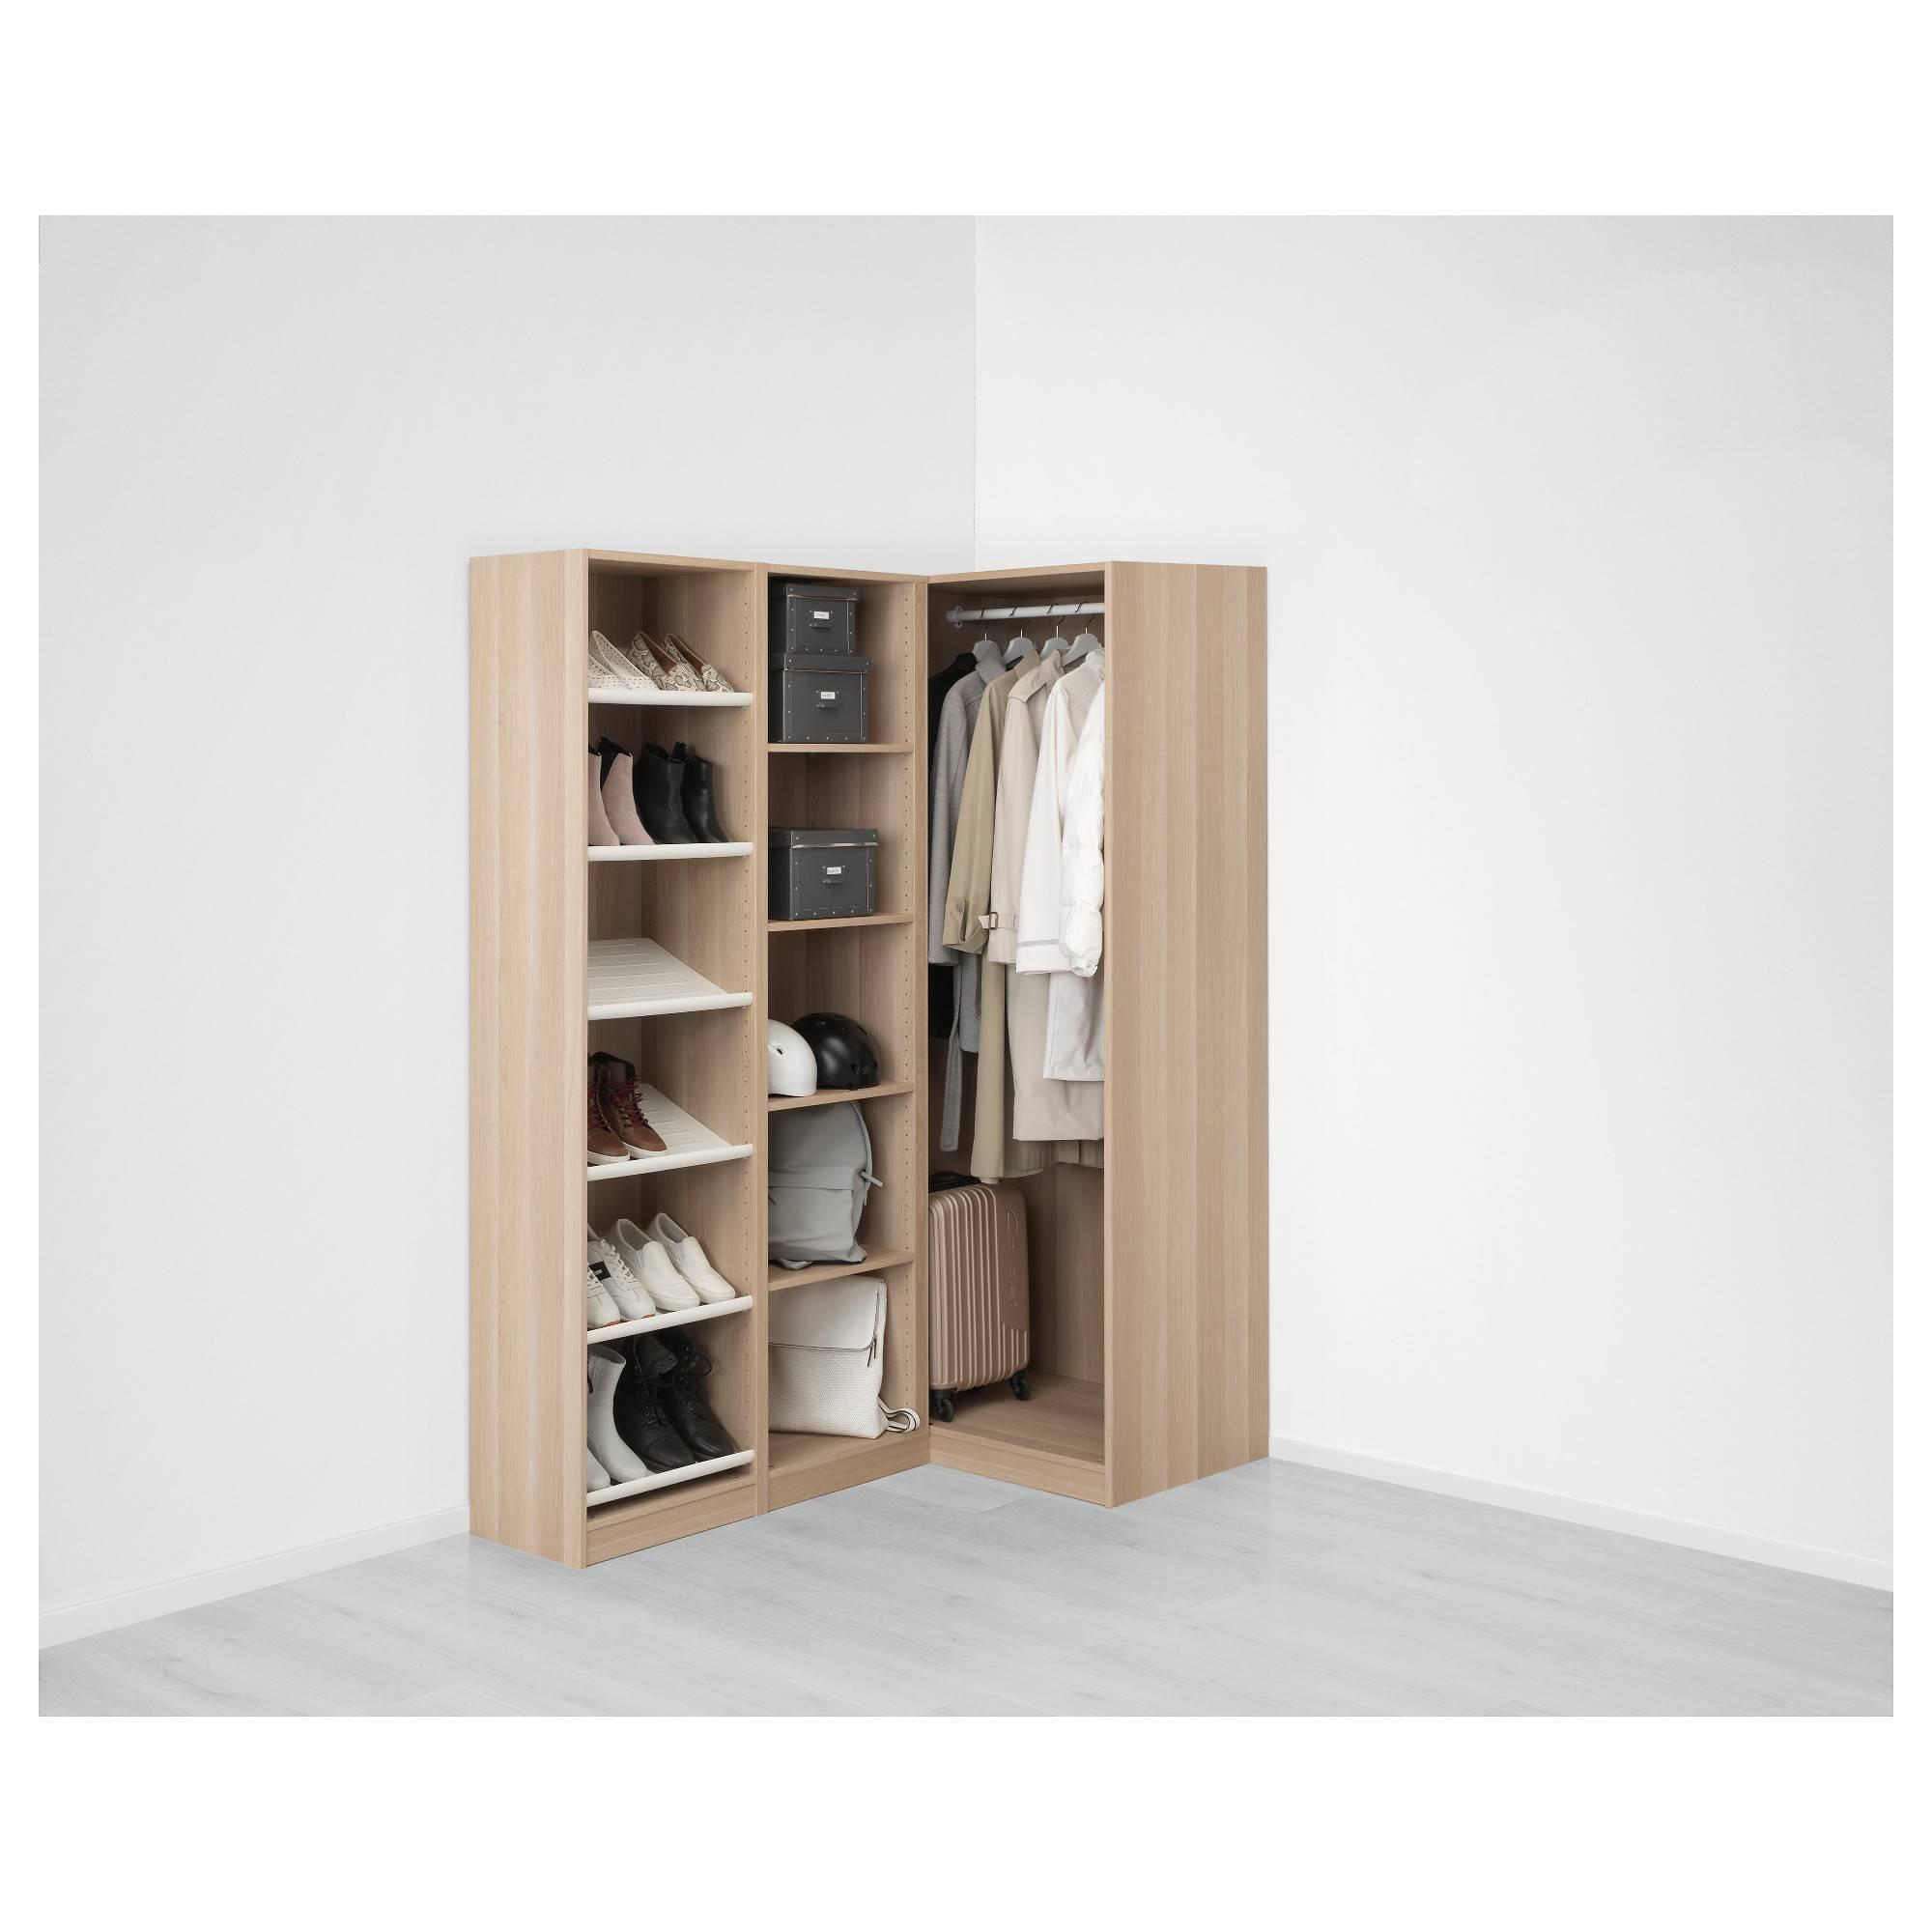 Pax Corner Wardrobe White Stained Oak Effect/nexus Vikedal 160 Regarding Oak Corner Wardrobes (View 15 of 15)